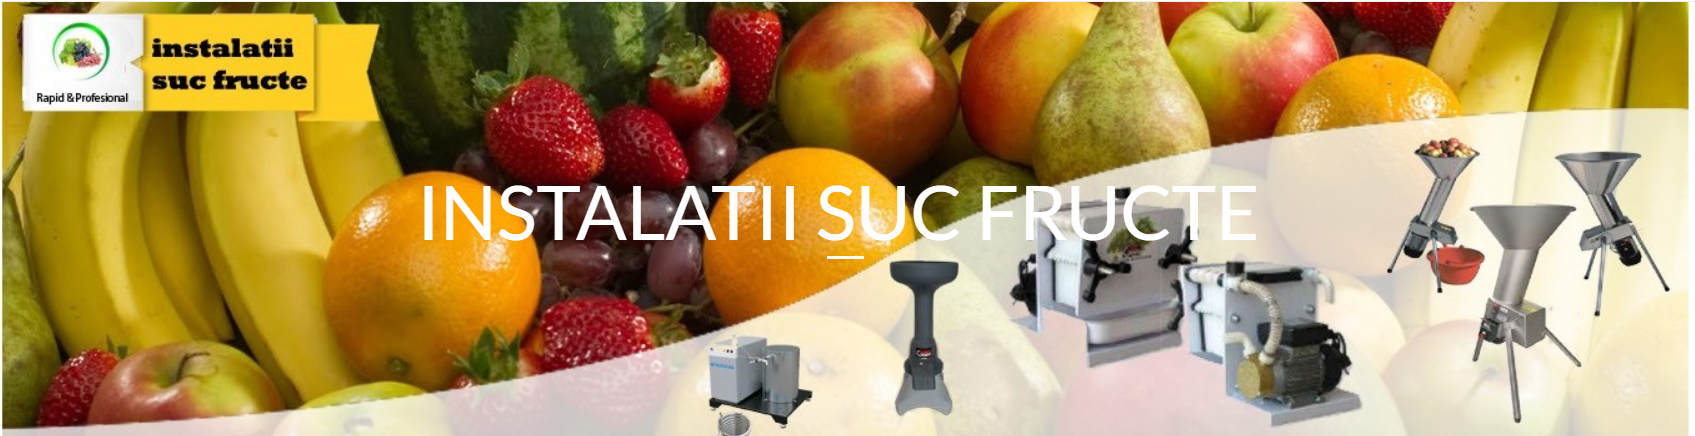 instalatii suc de fructe